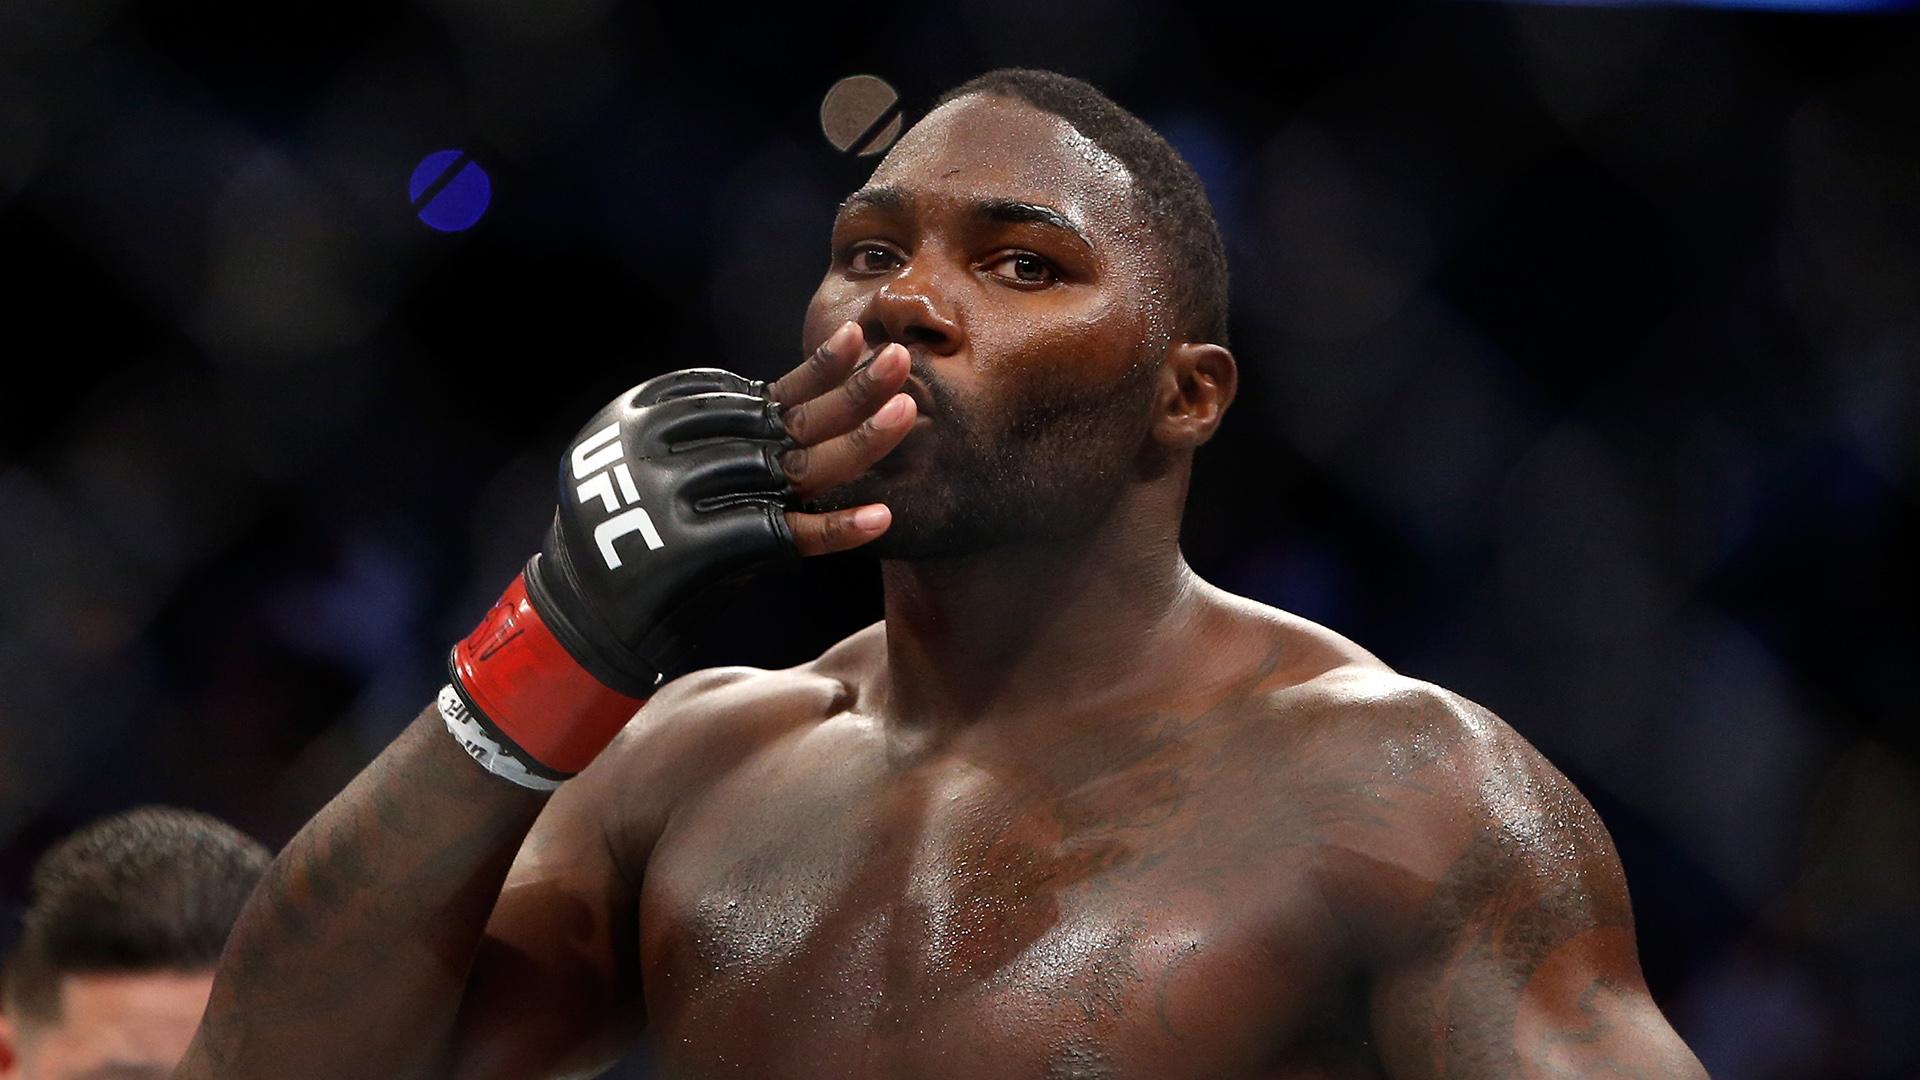 Anthony Johnson came back to fight Jon Jones at light heavyweight